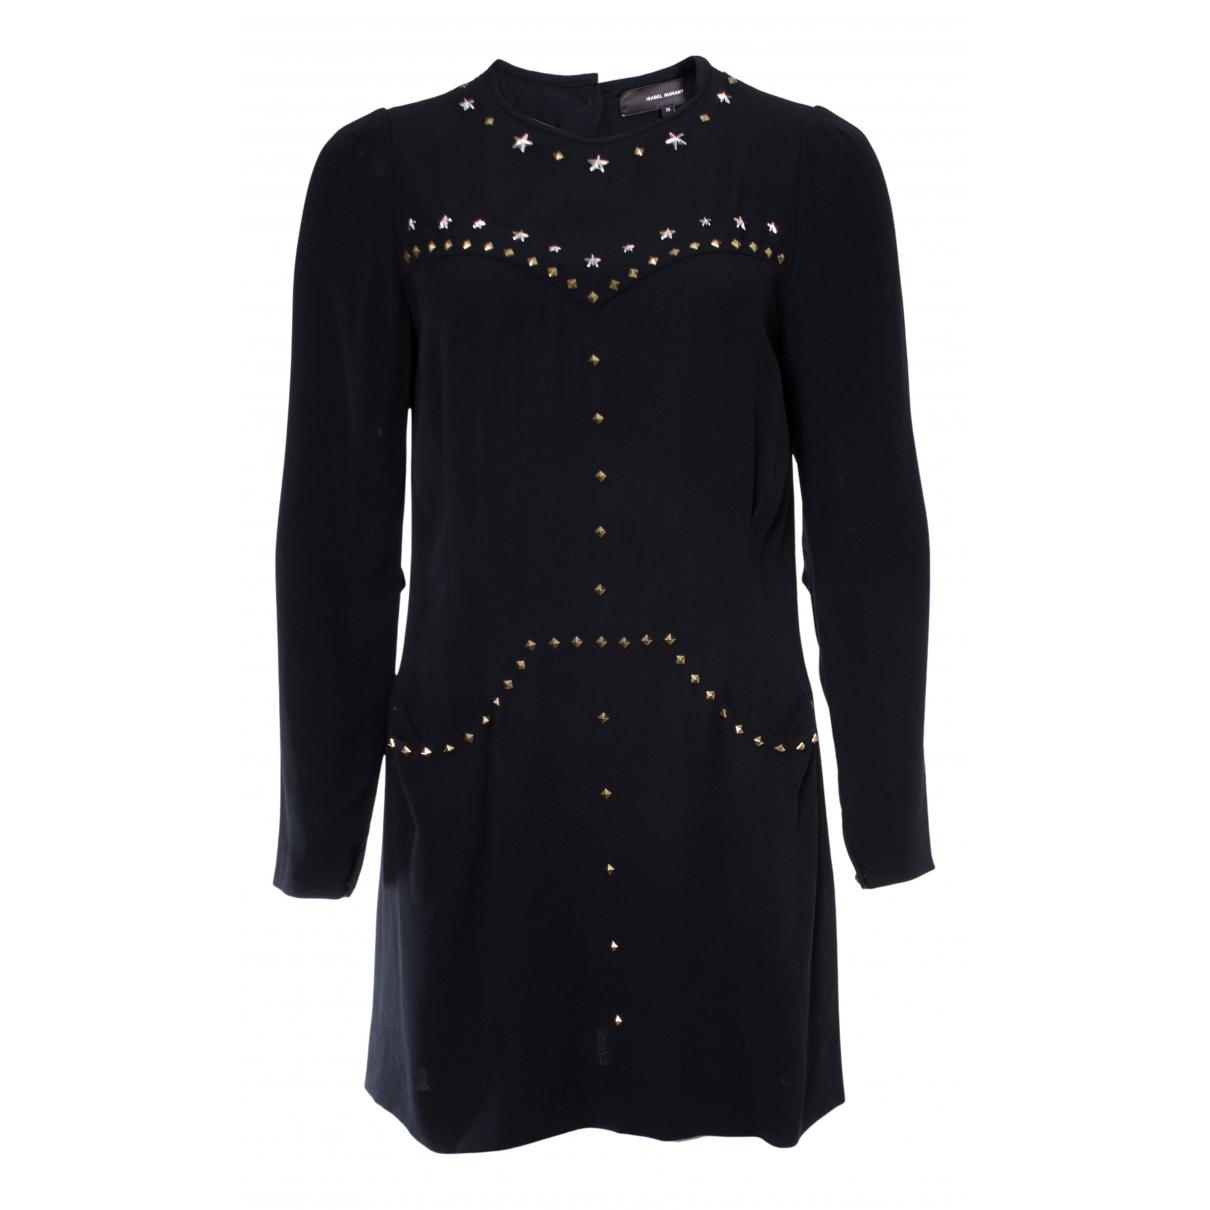 Isabel Marant \N Kleid in  Schwarz Synthetik